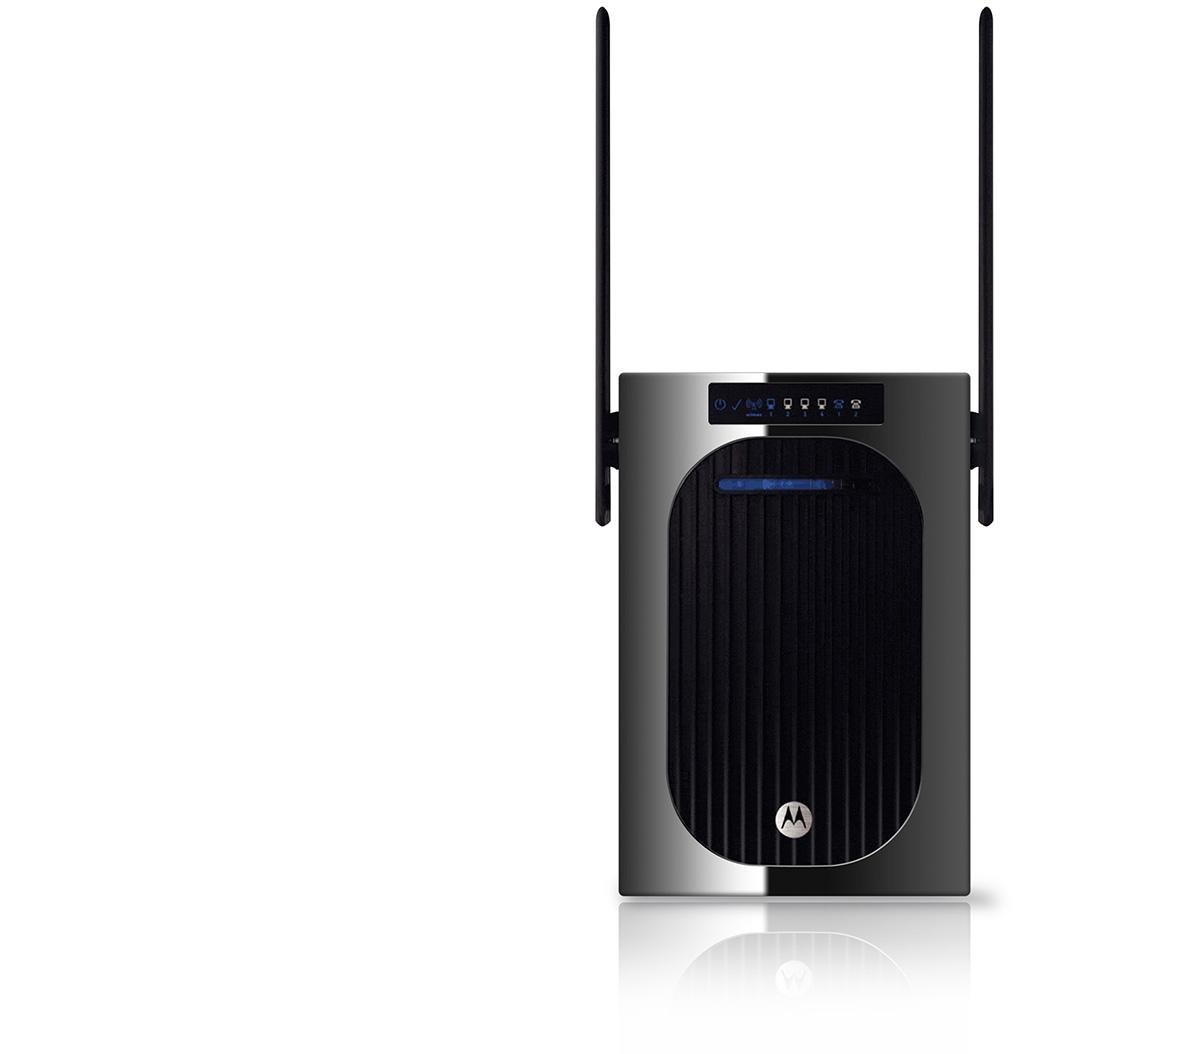 motorola router product design